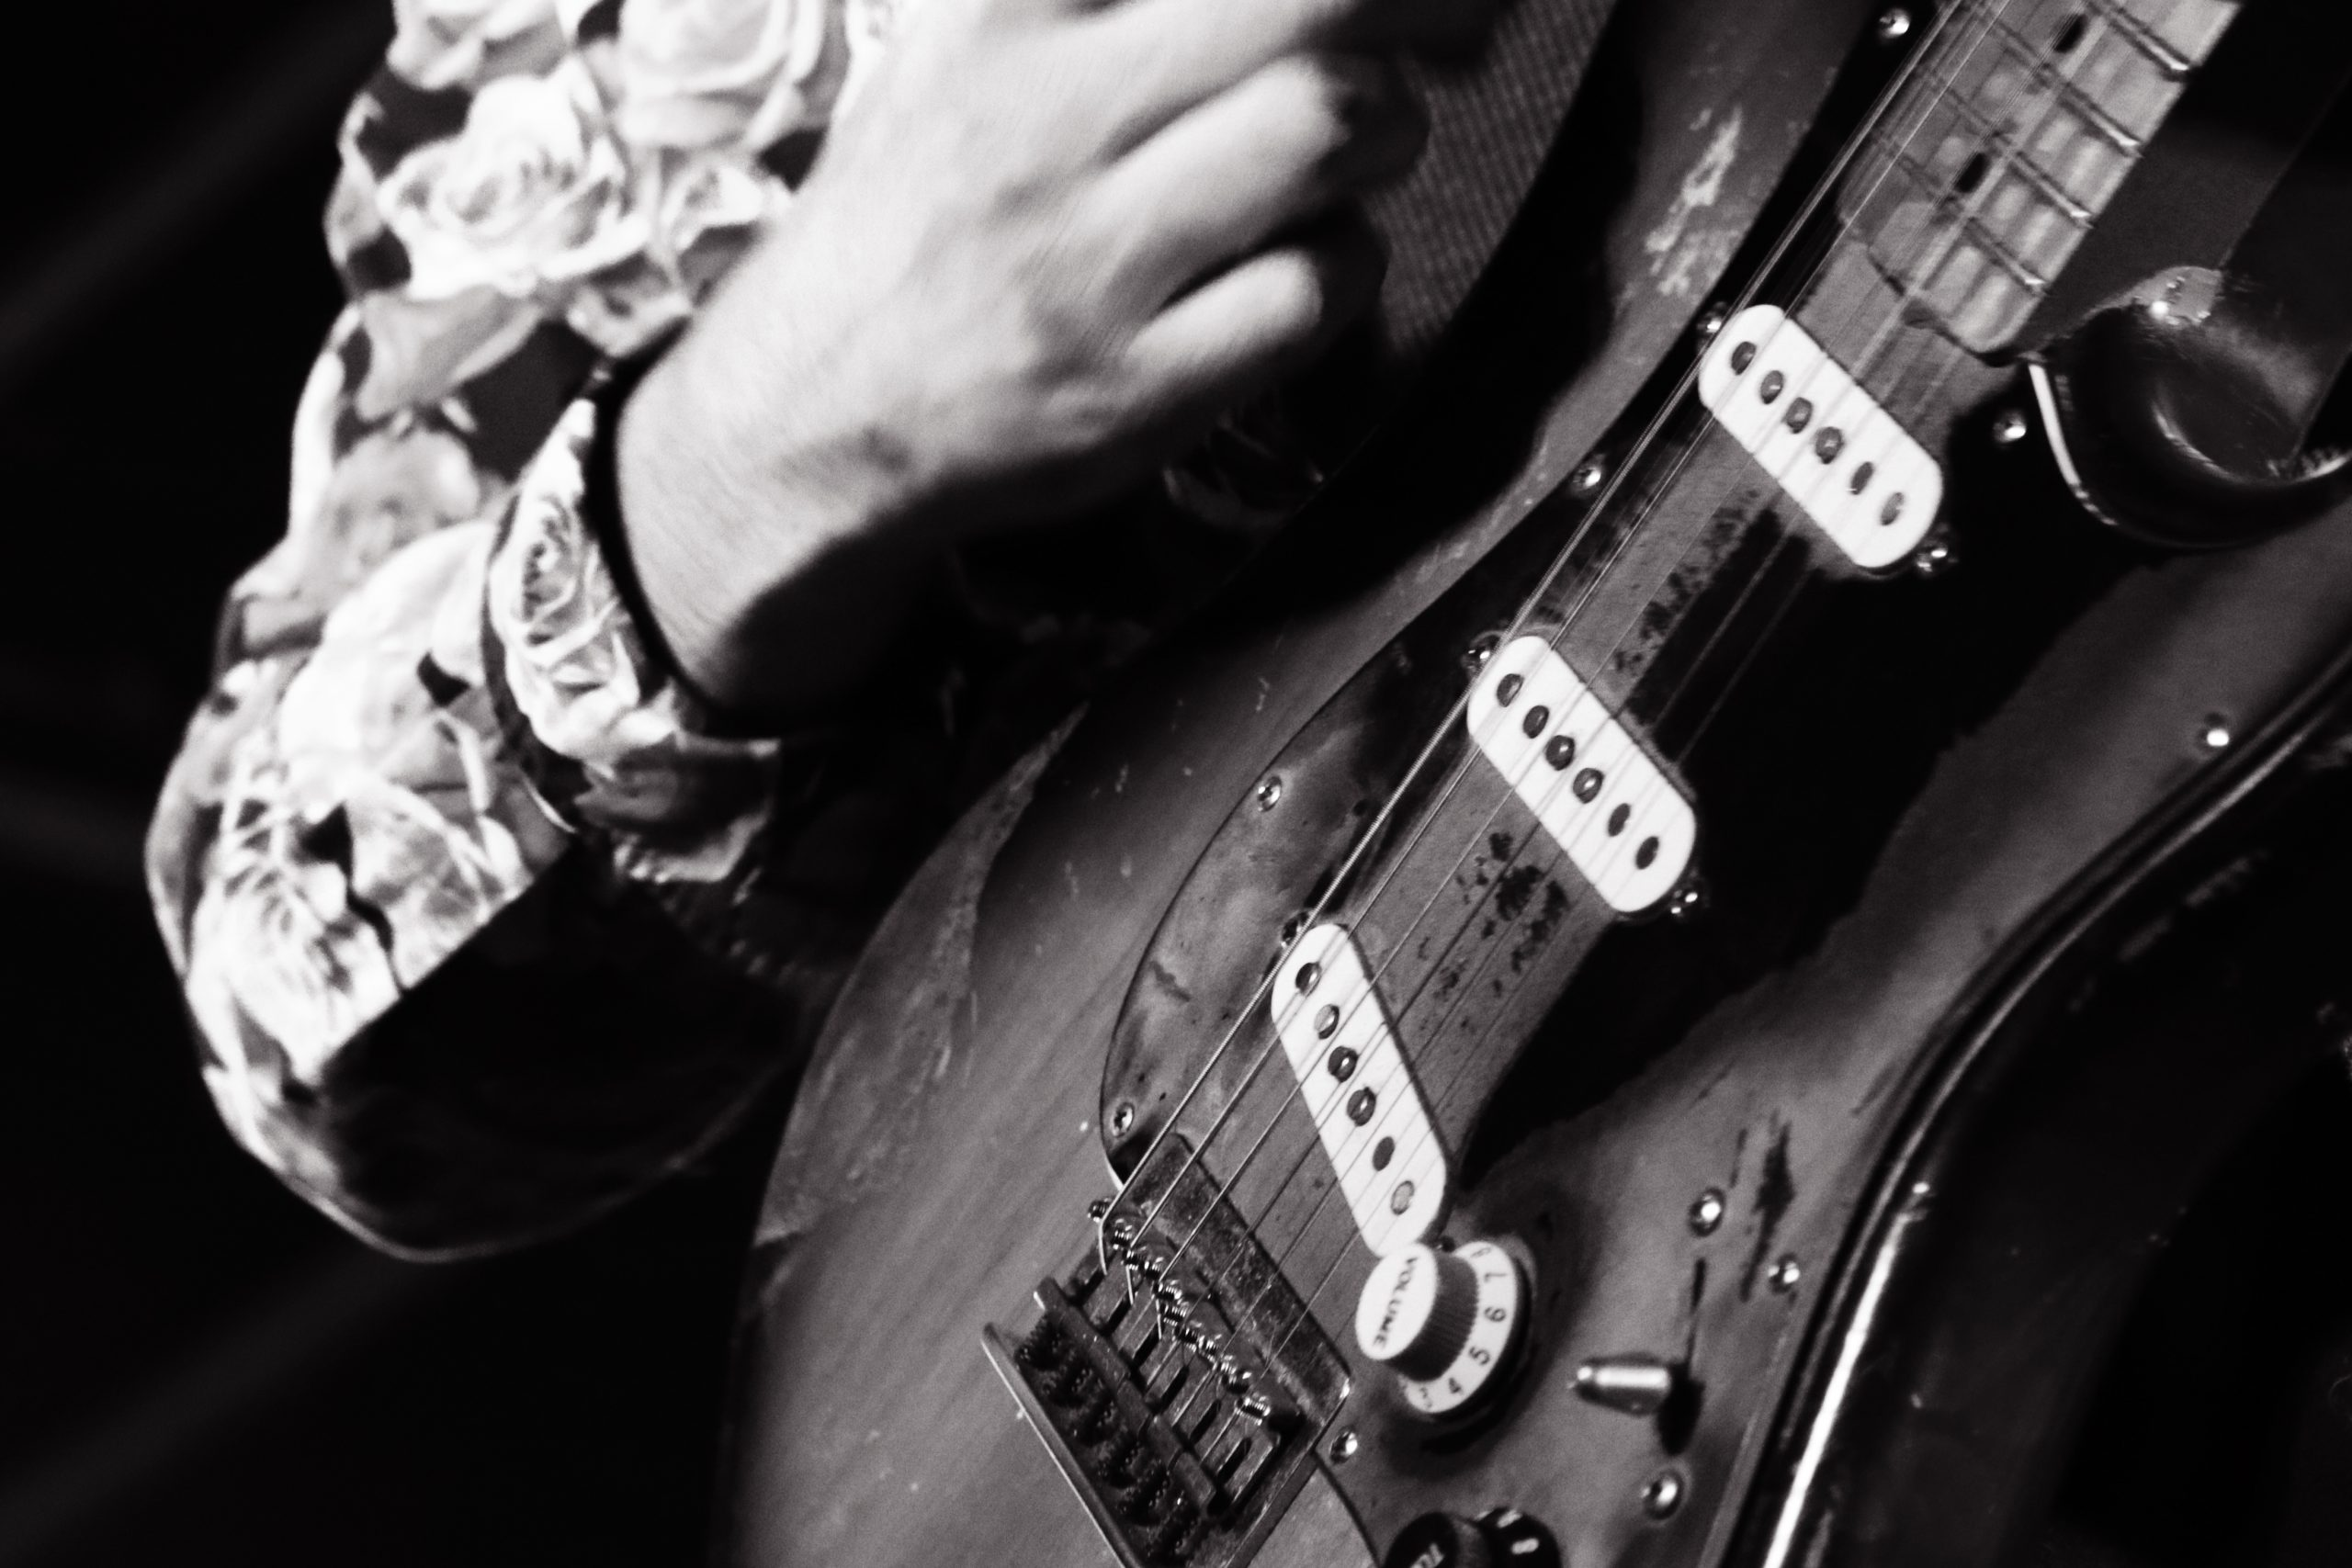 【Canon】音楽とモノクロ写真